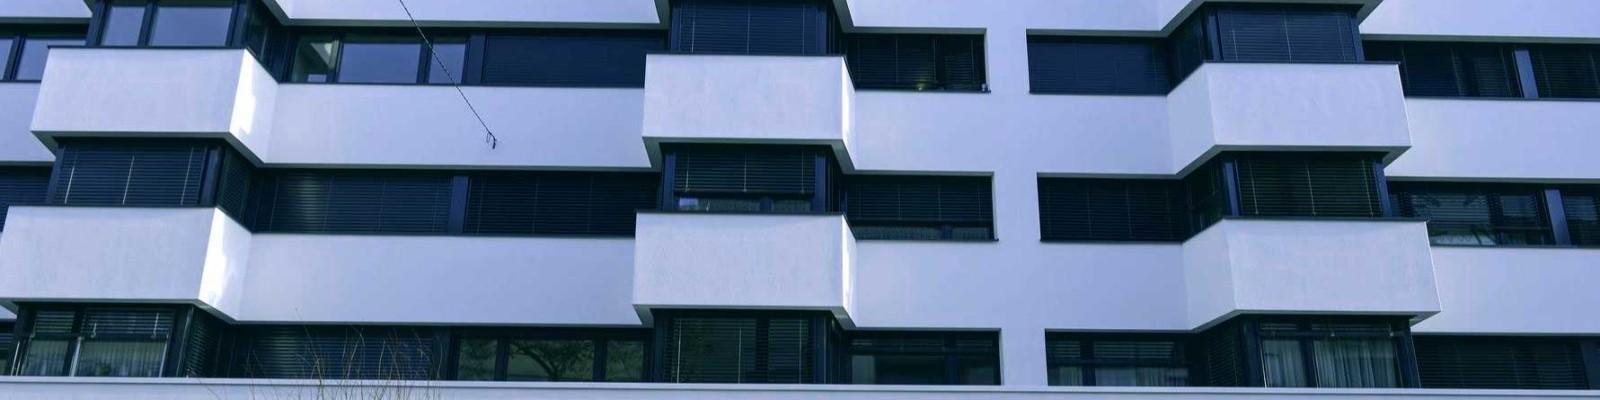 Aussenansicht Reproduktionsmedizin Universitätsspital Basel